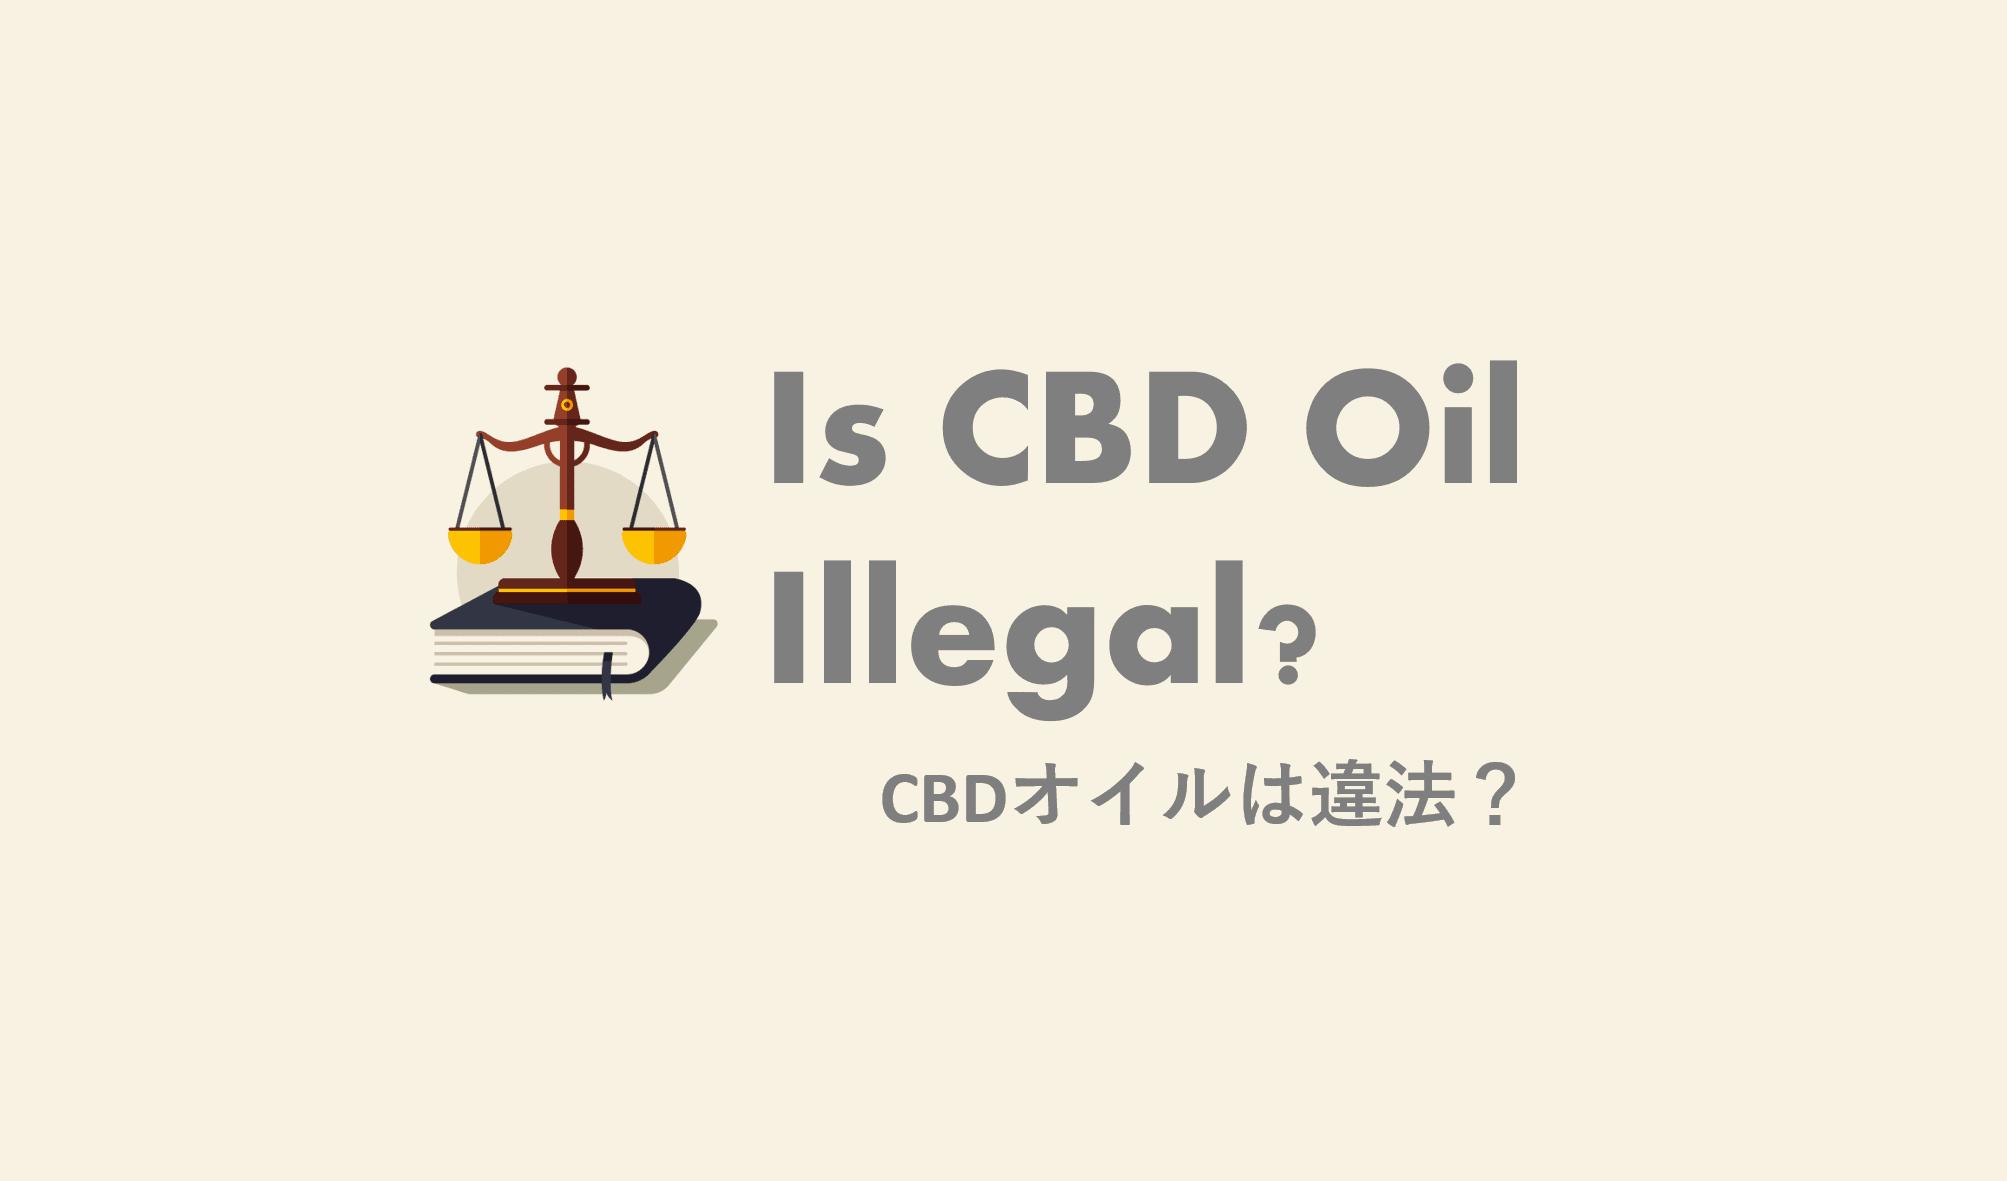 CBDオイルは違法か合法か?実は違法なCBDオイルも存在